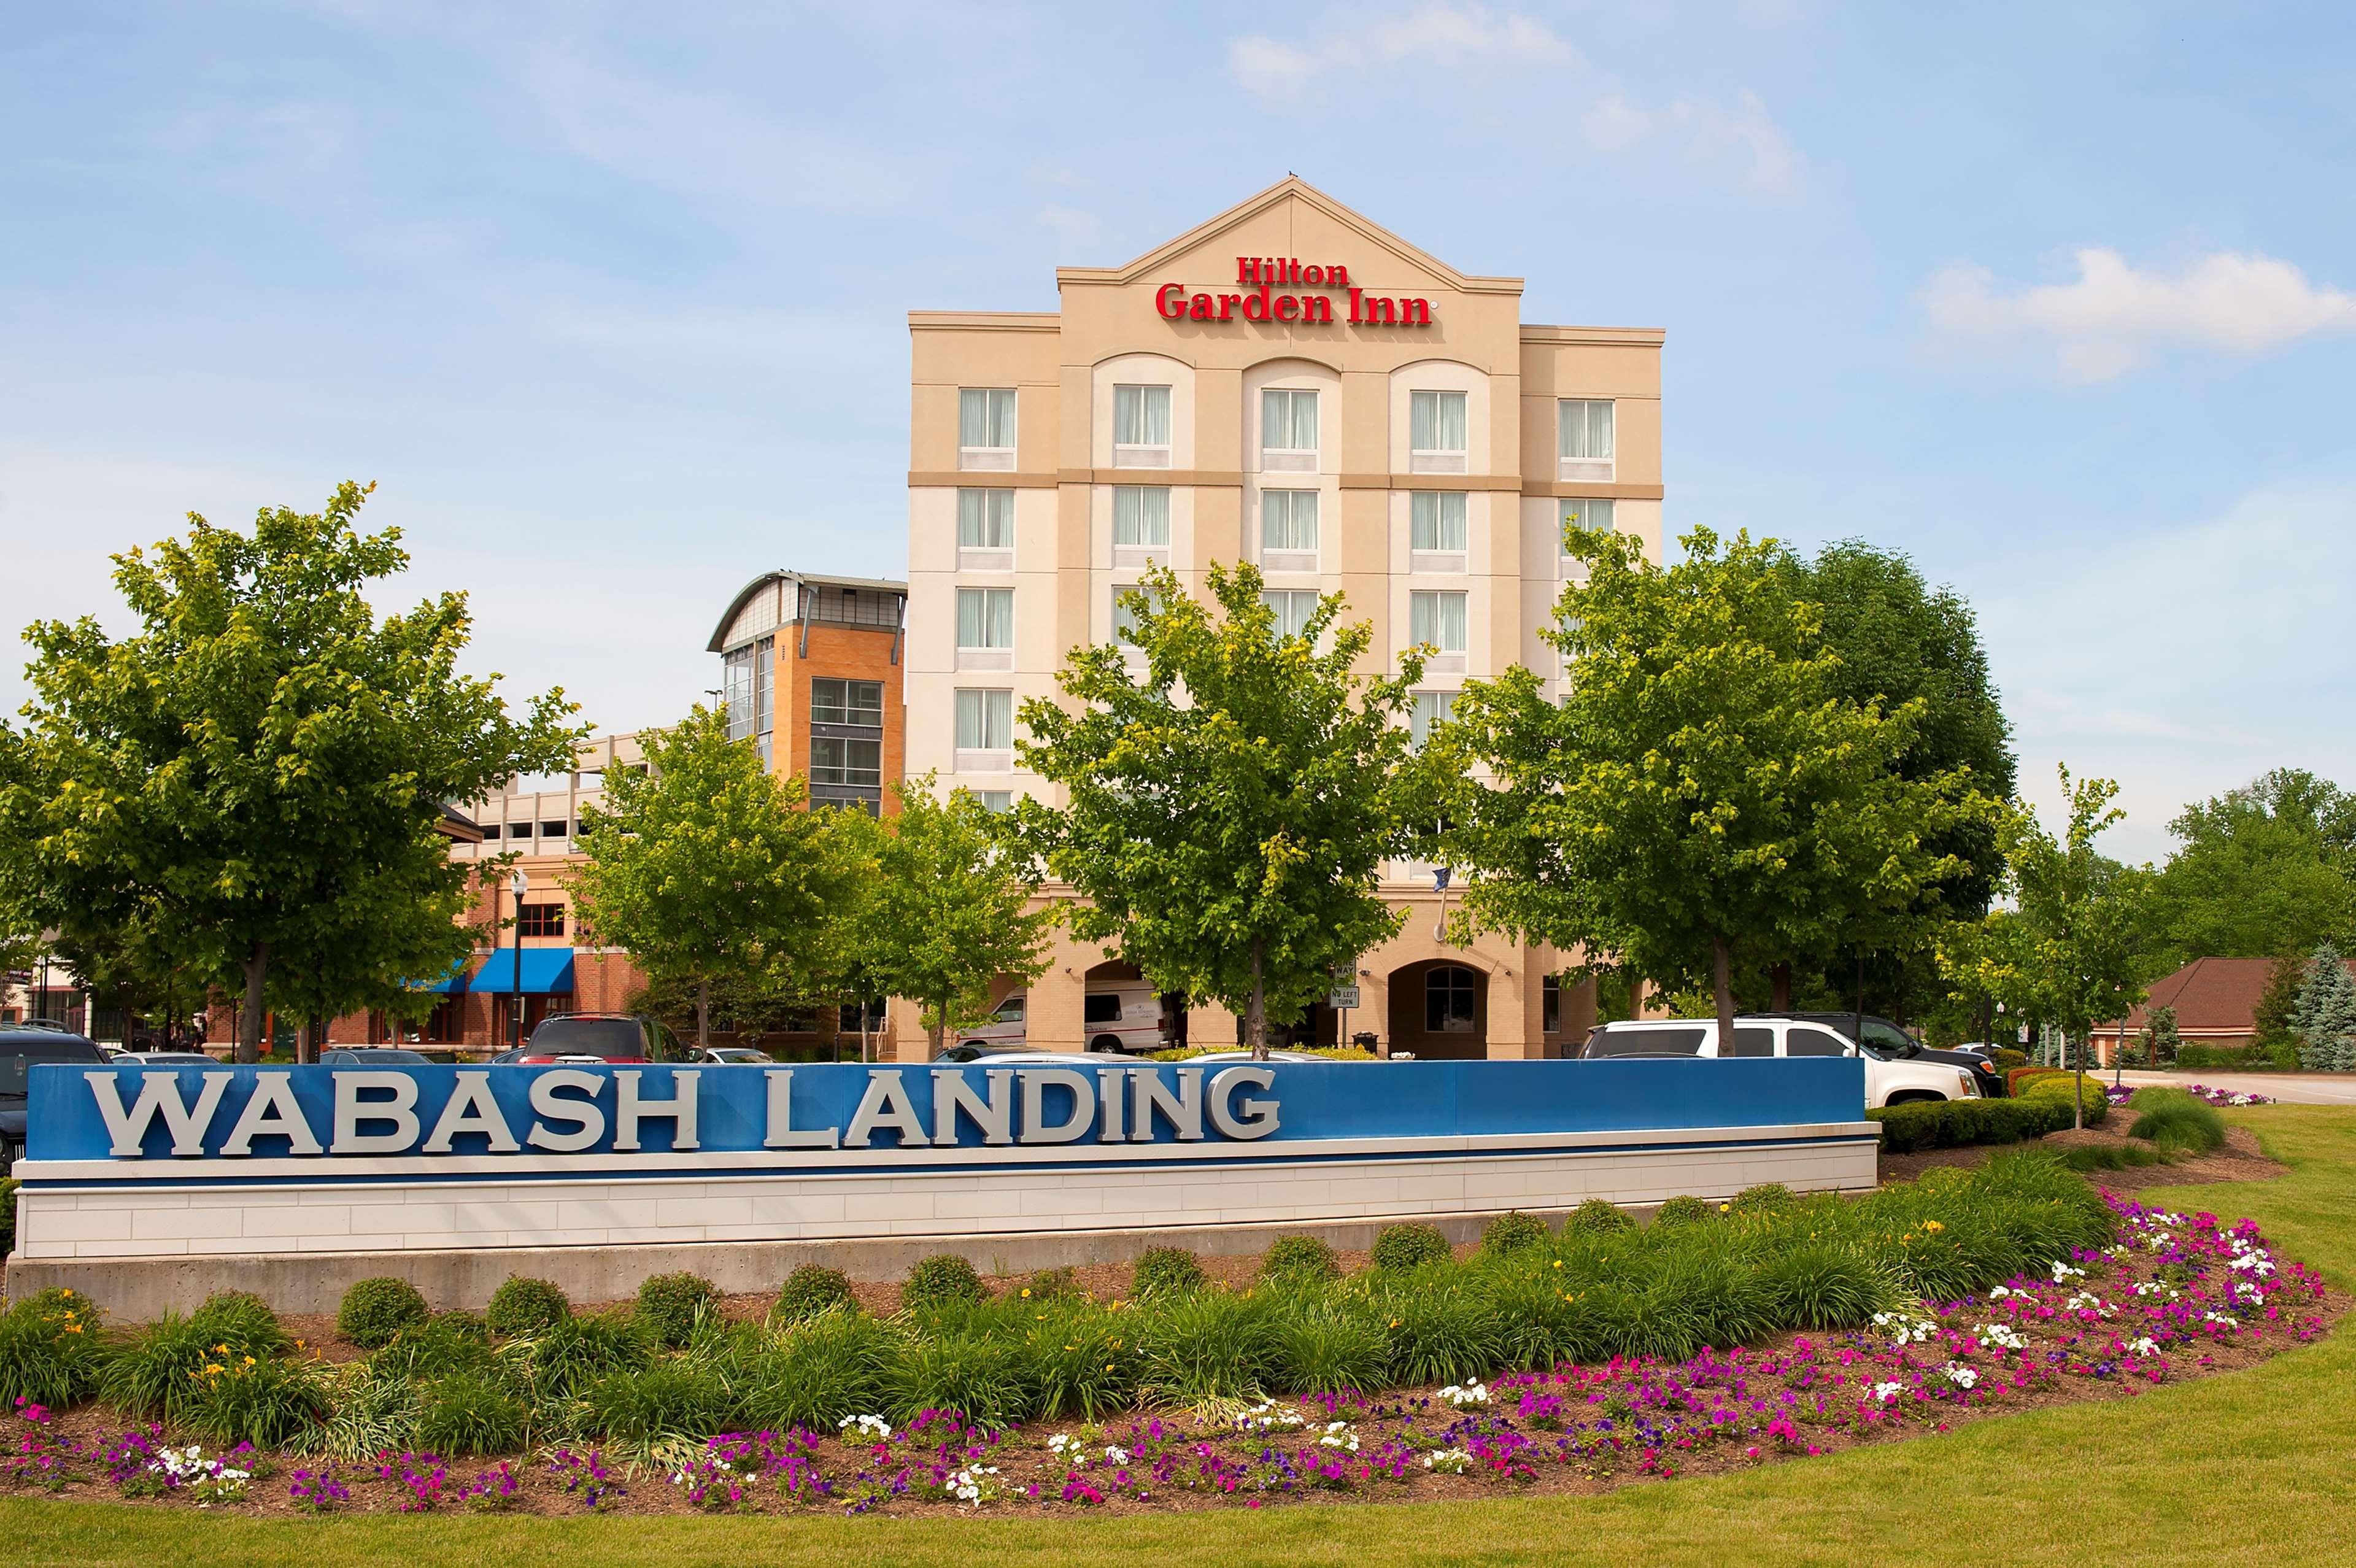 Hilton Garden Inn West Lafayette Wabash Landing image 0